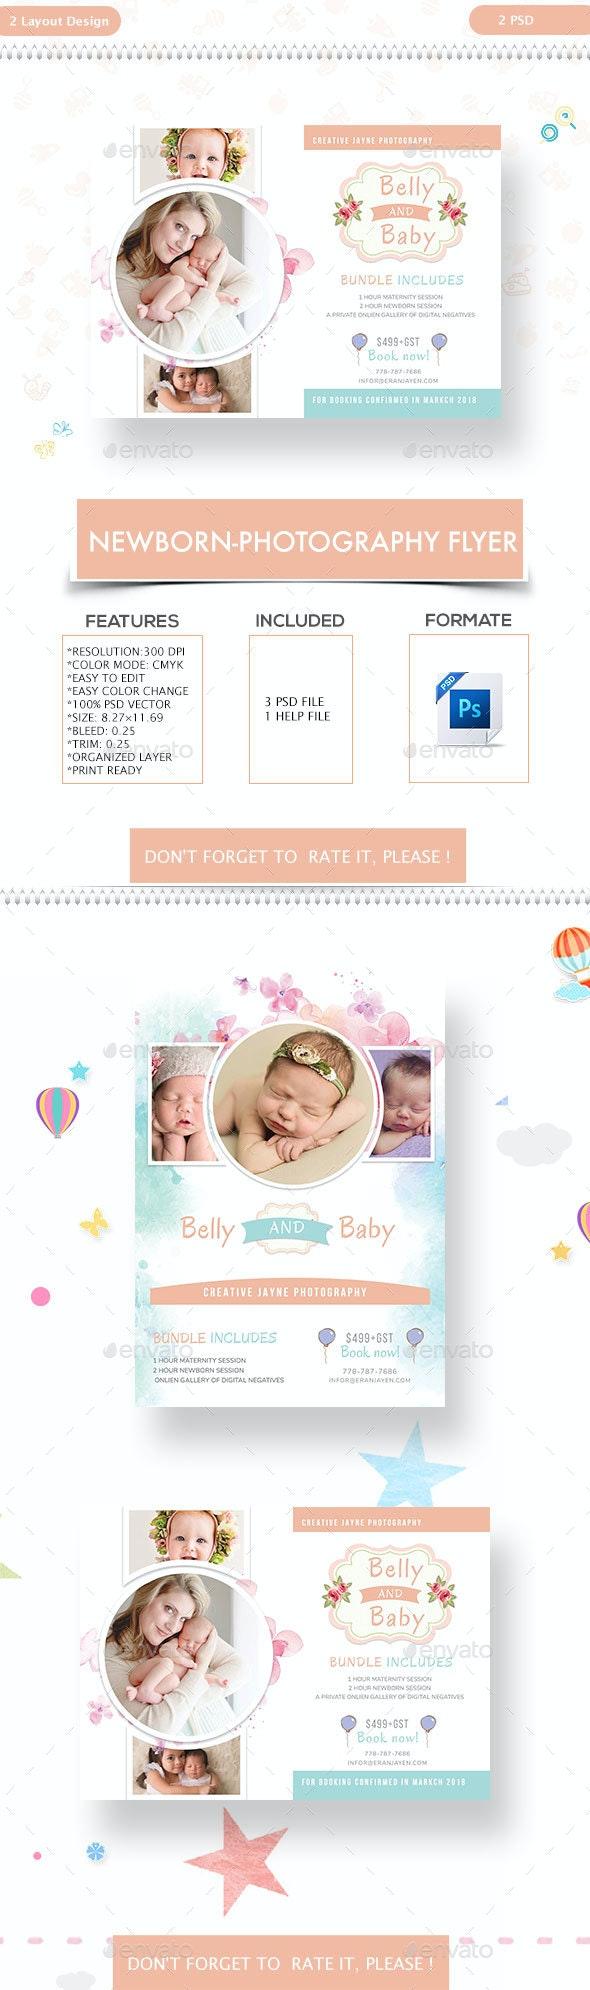 Newborn-Photography Flyer - Commerce Flyers